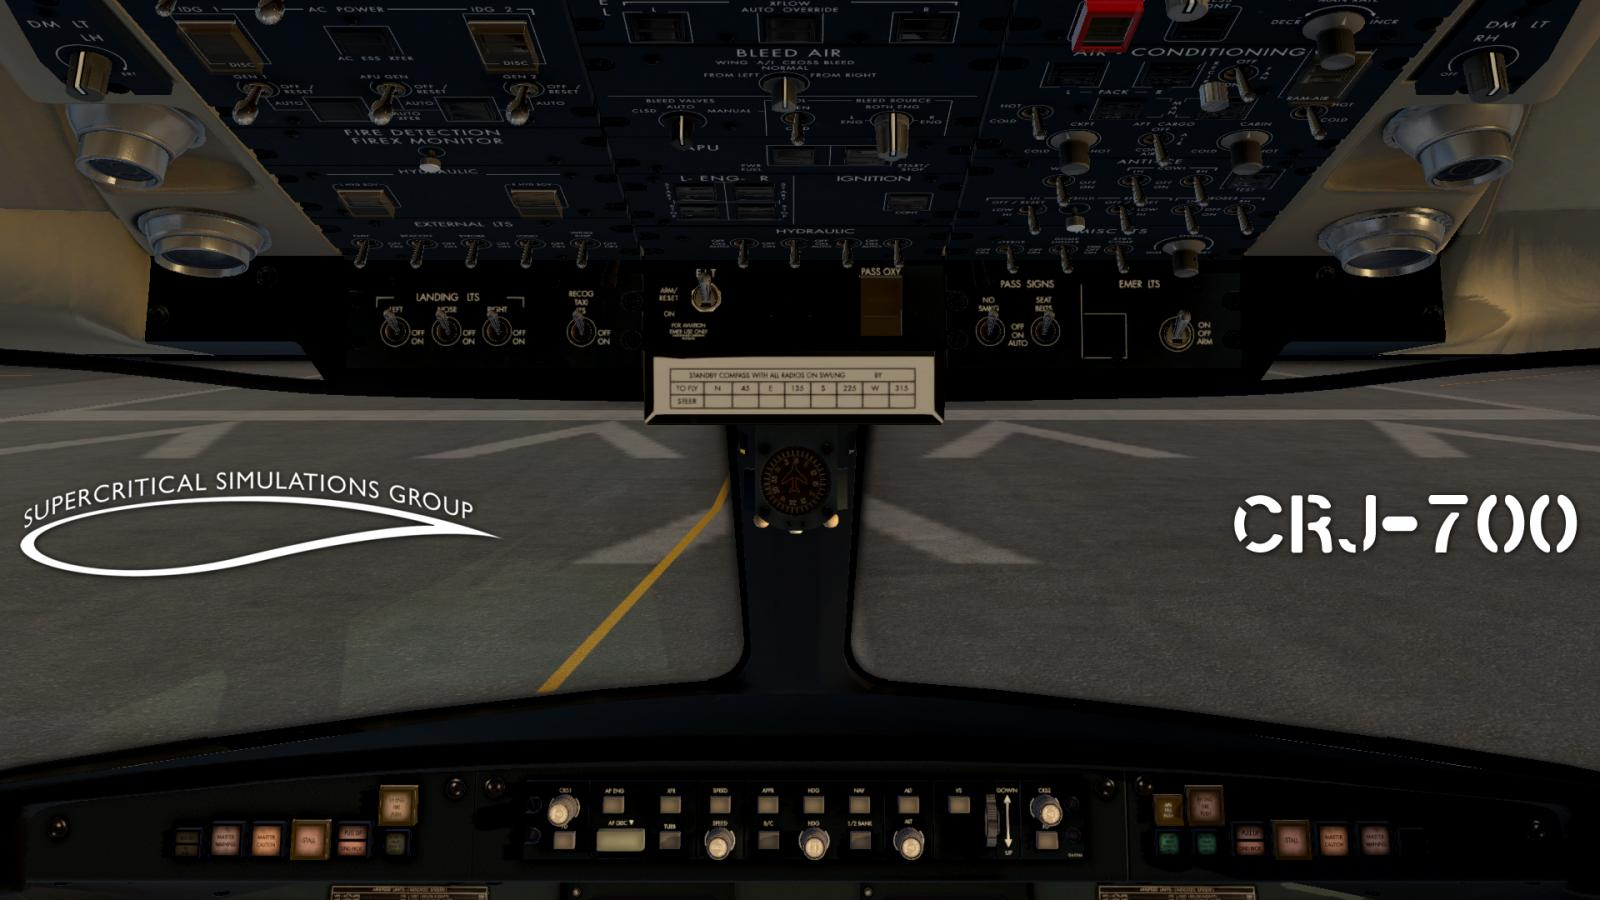 CRJ 700 34.jpg.2703e3a46dc4612a3e5cf36ef964bcd1